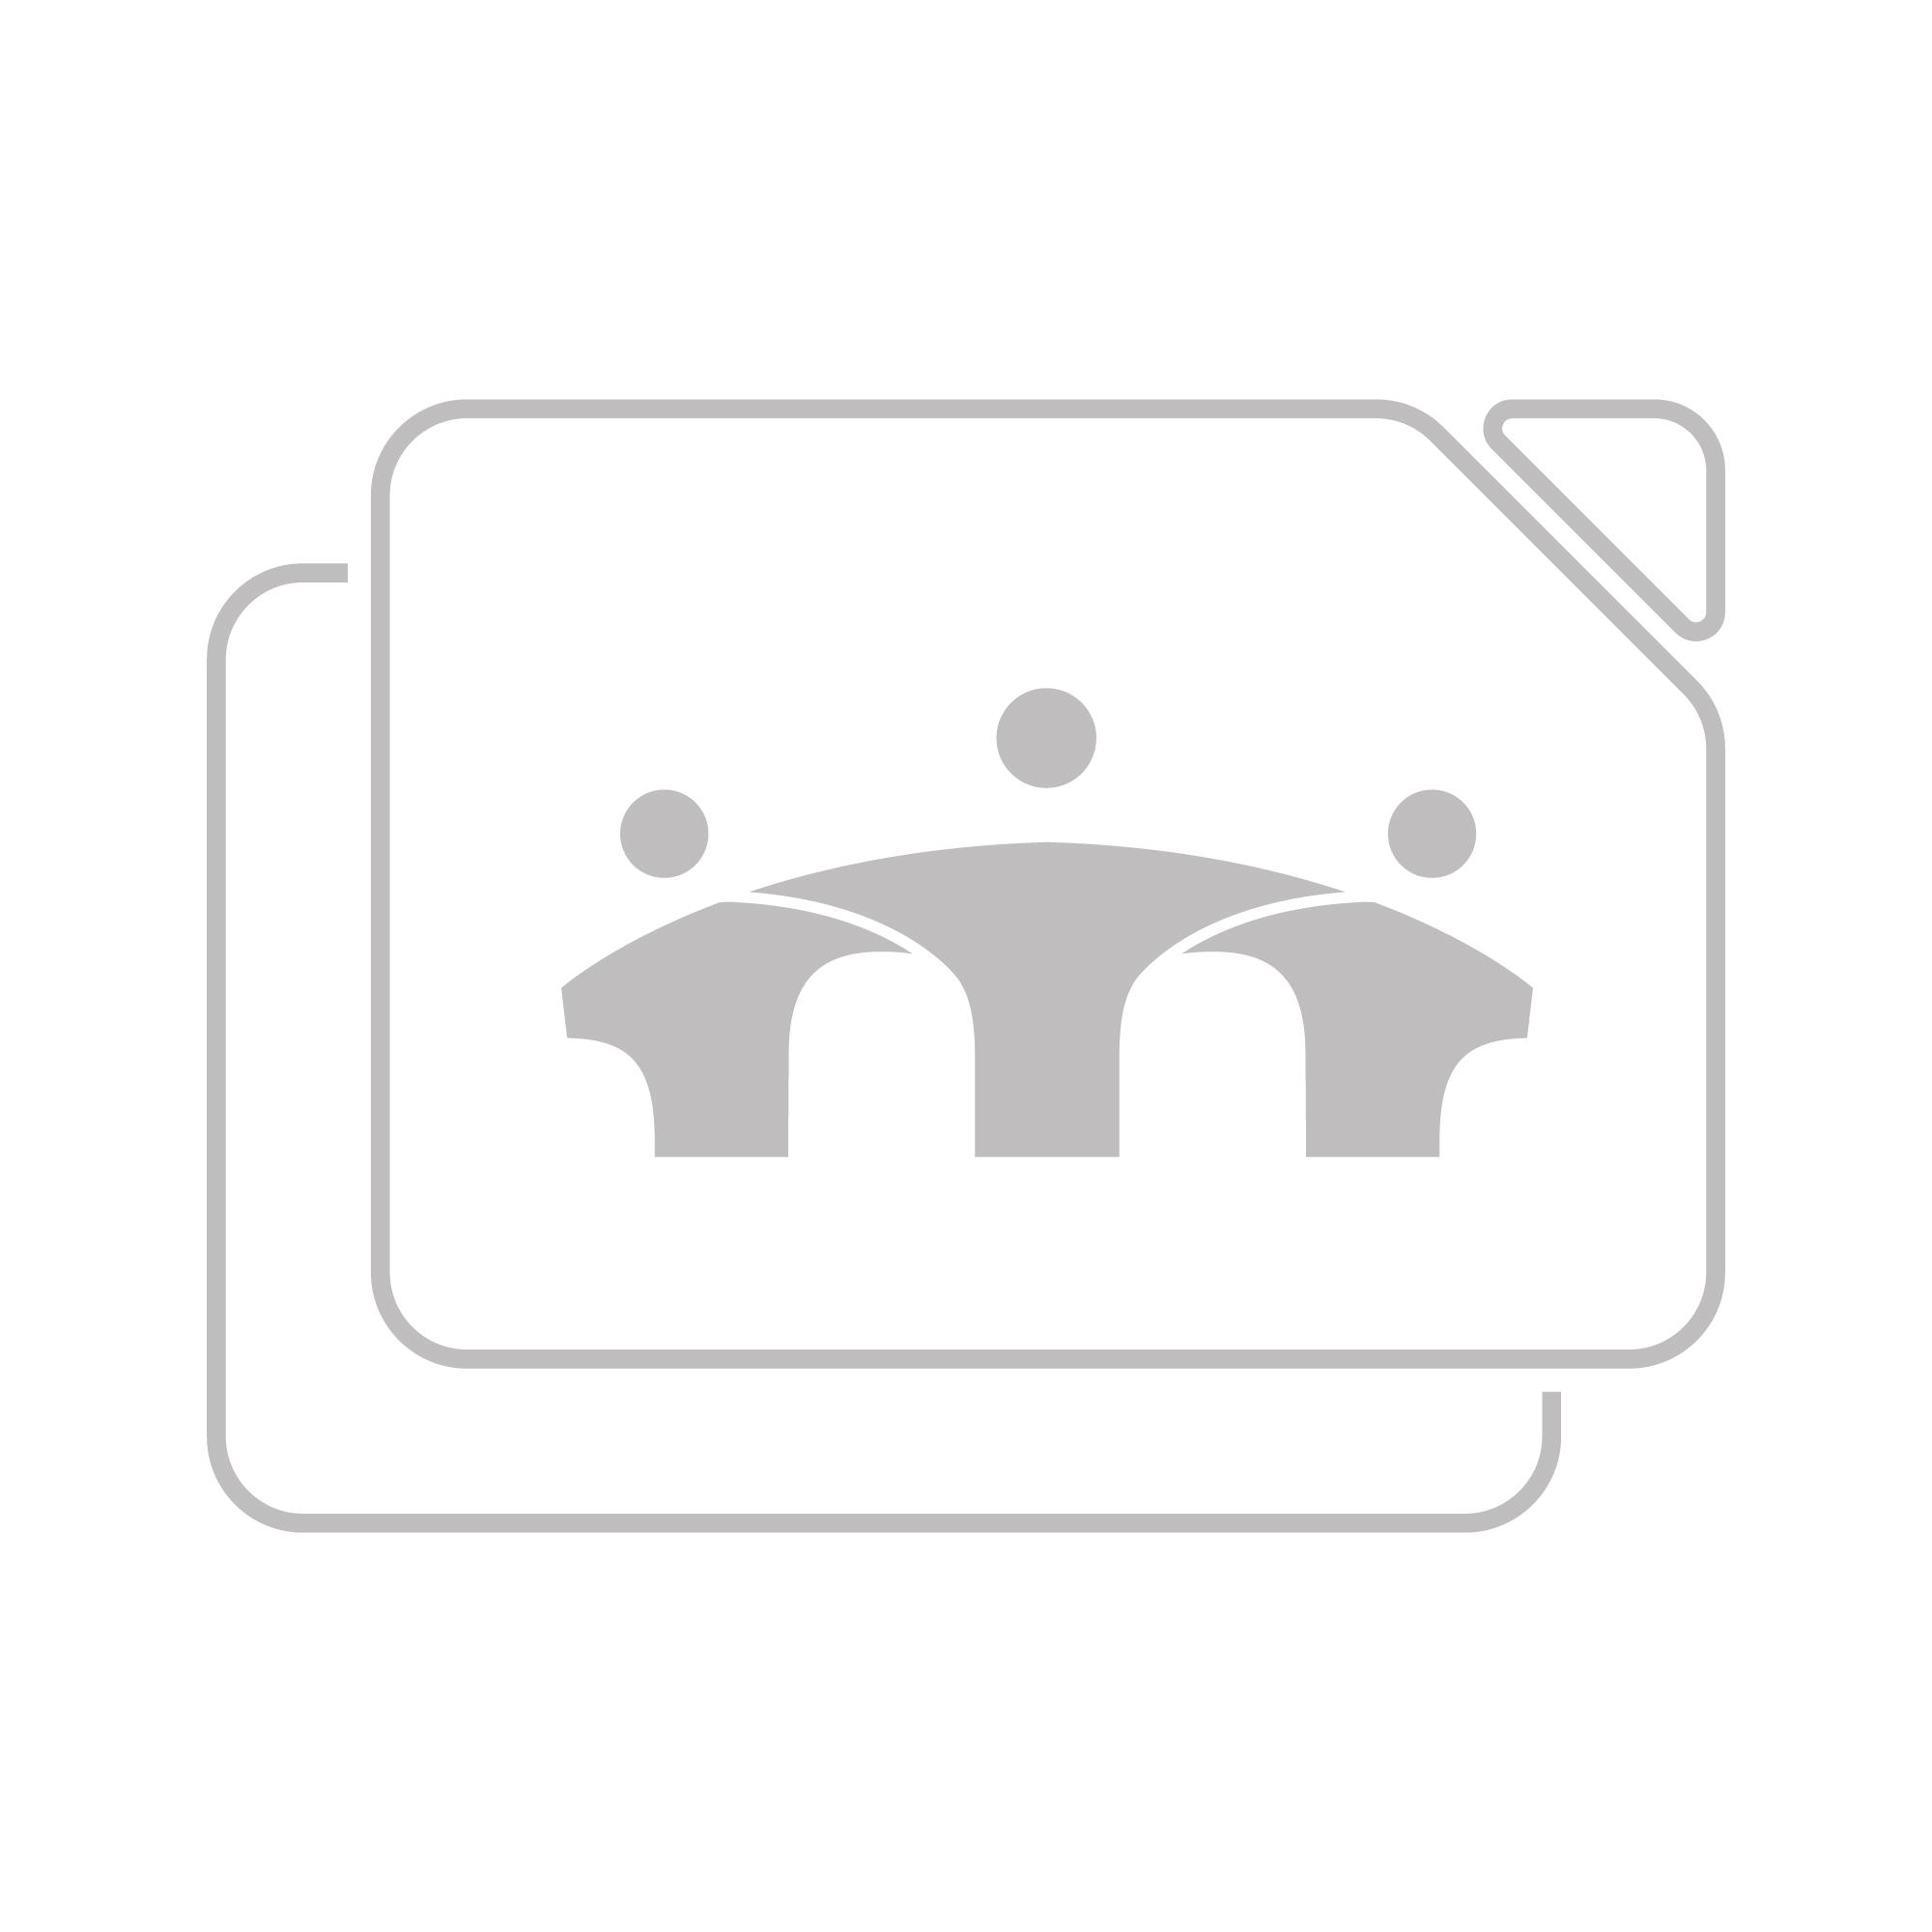 Mersive Solstice Pod Gen3 Unlimited Enterprise with 4 year Solstice Subscription